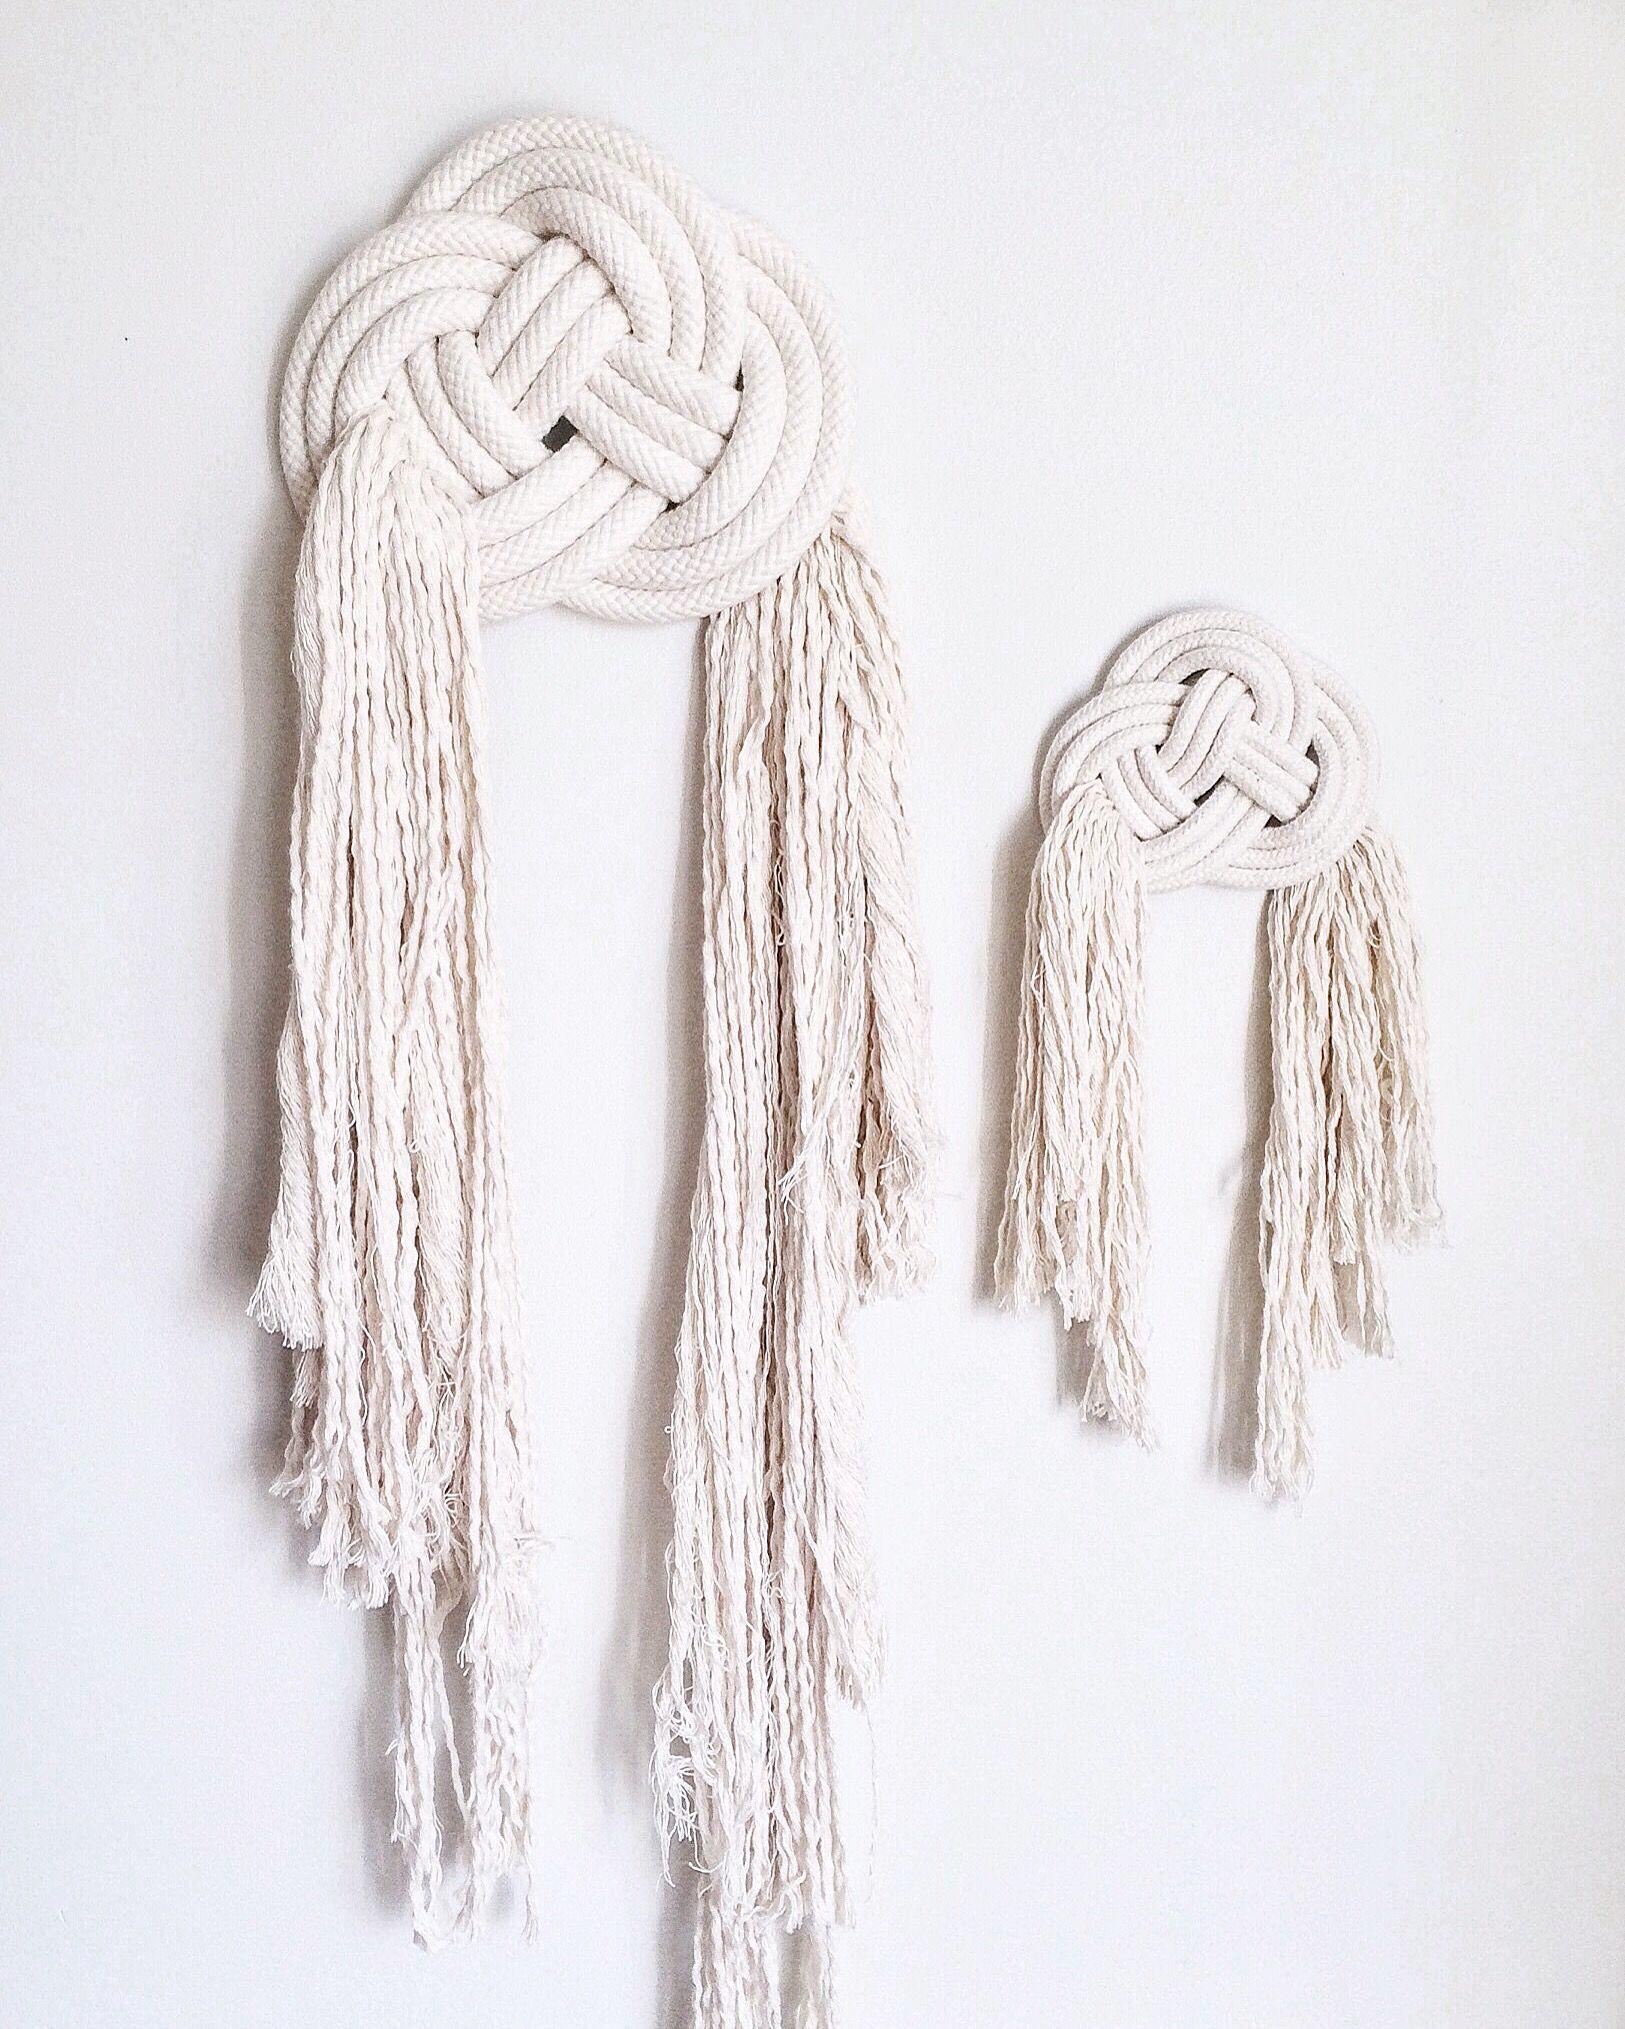 Double Coin Knot Wall Hangings Sara Clark Modern Macrame Rope Art Macrame Wall Art Nautical Rope Decor Macrame Knots